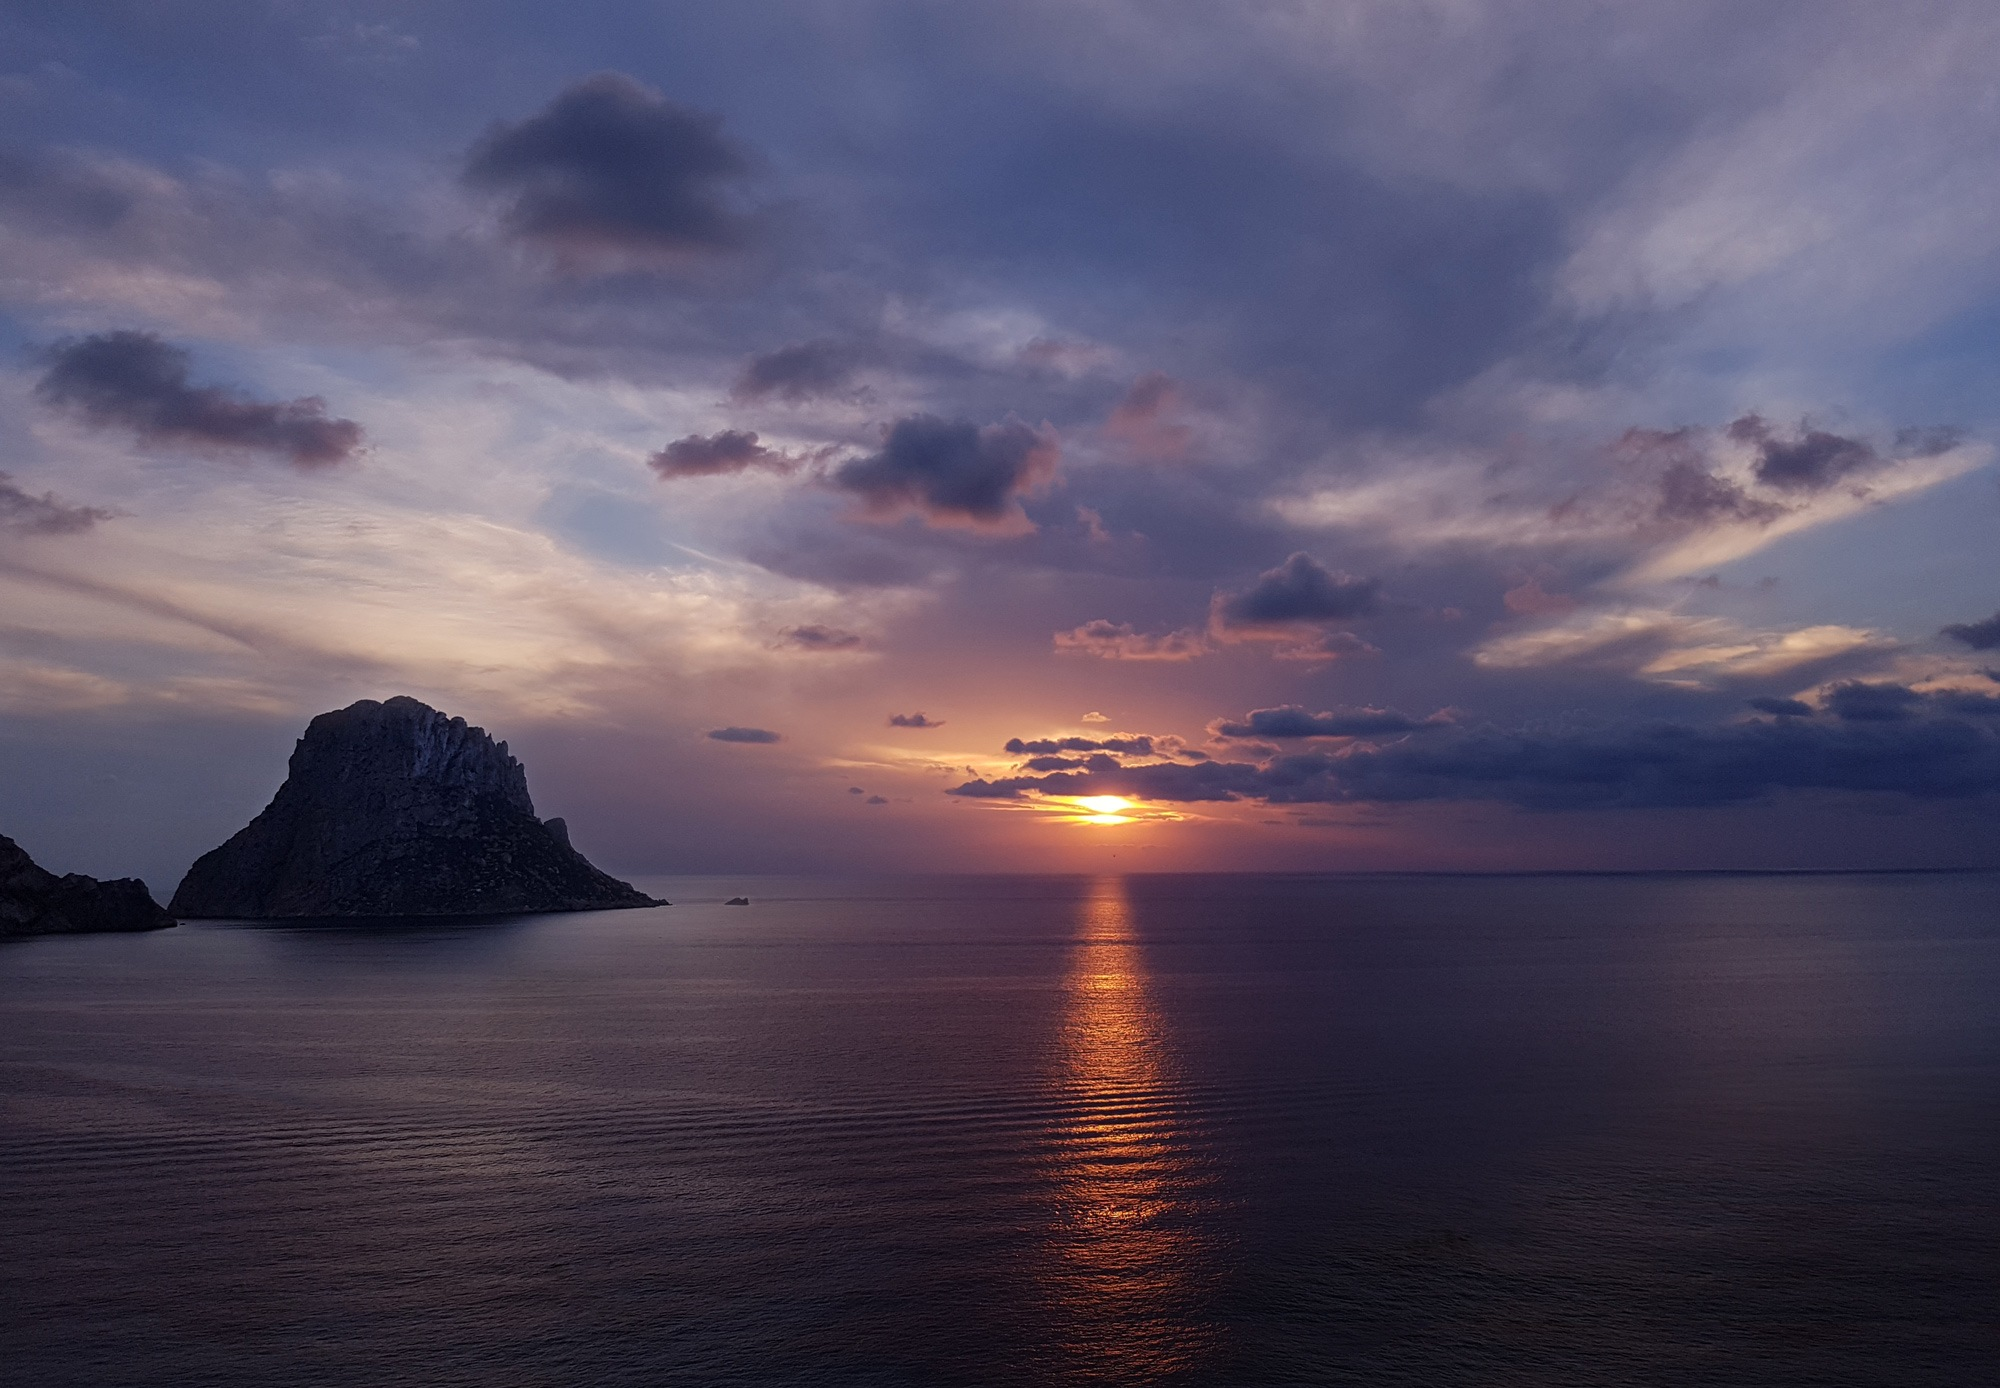 Ibiza Sunset by DJP ART